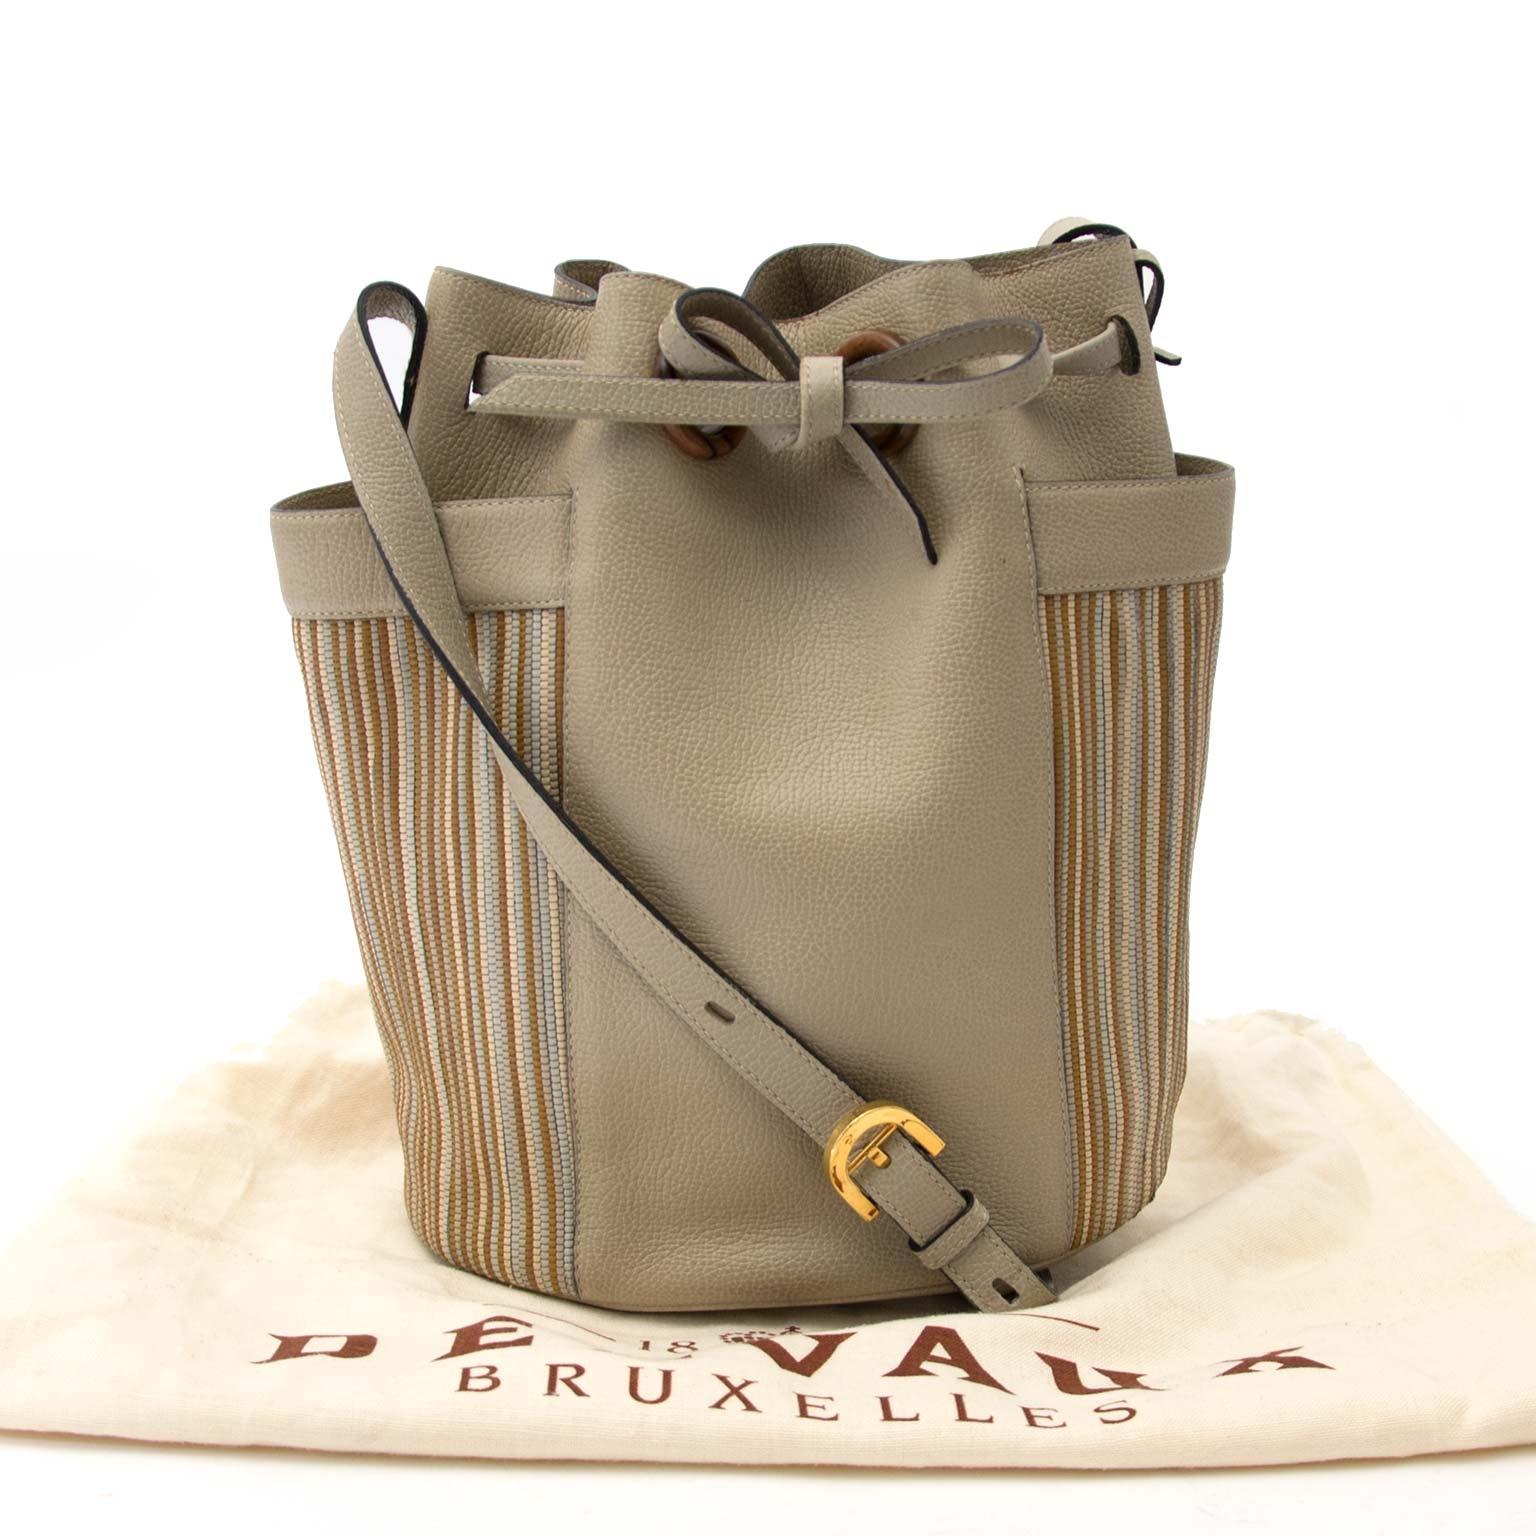 ab5641576d3 ... sale online at Labellov Antwerp secondhand Delvaux Beige Leather and  Toile de Cuir Bucket Bag te koop